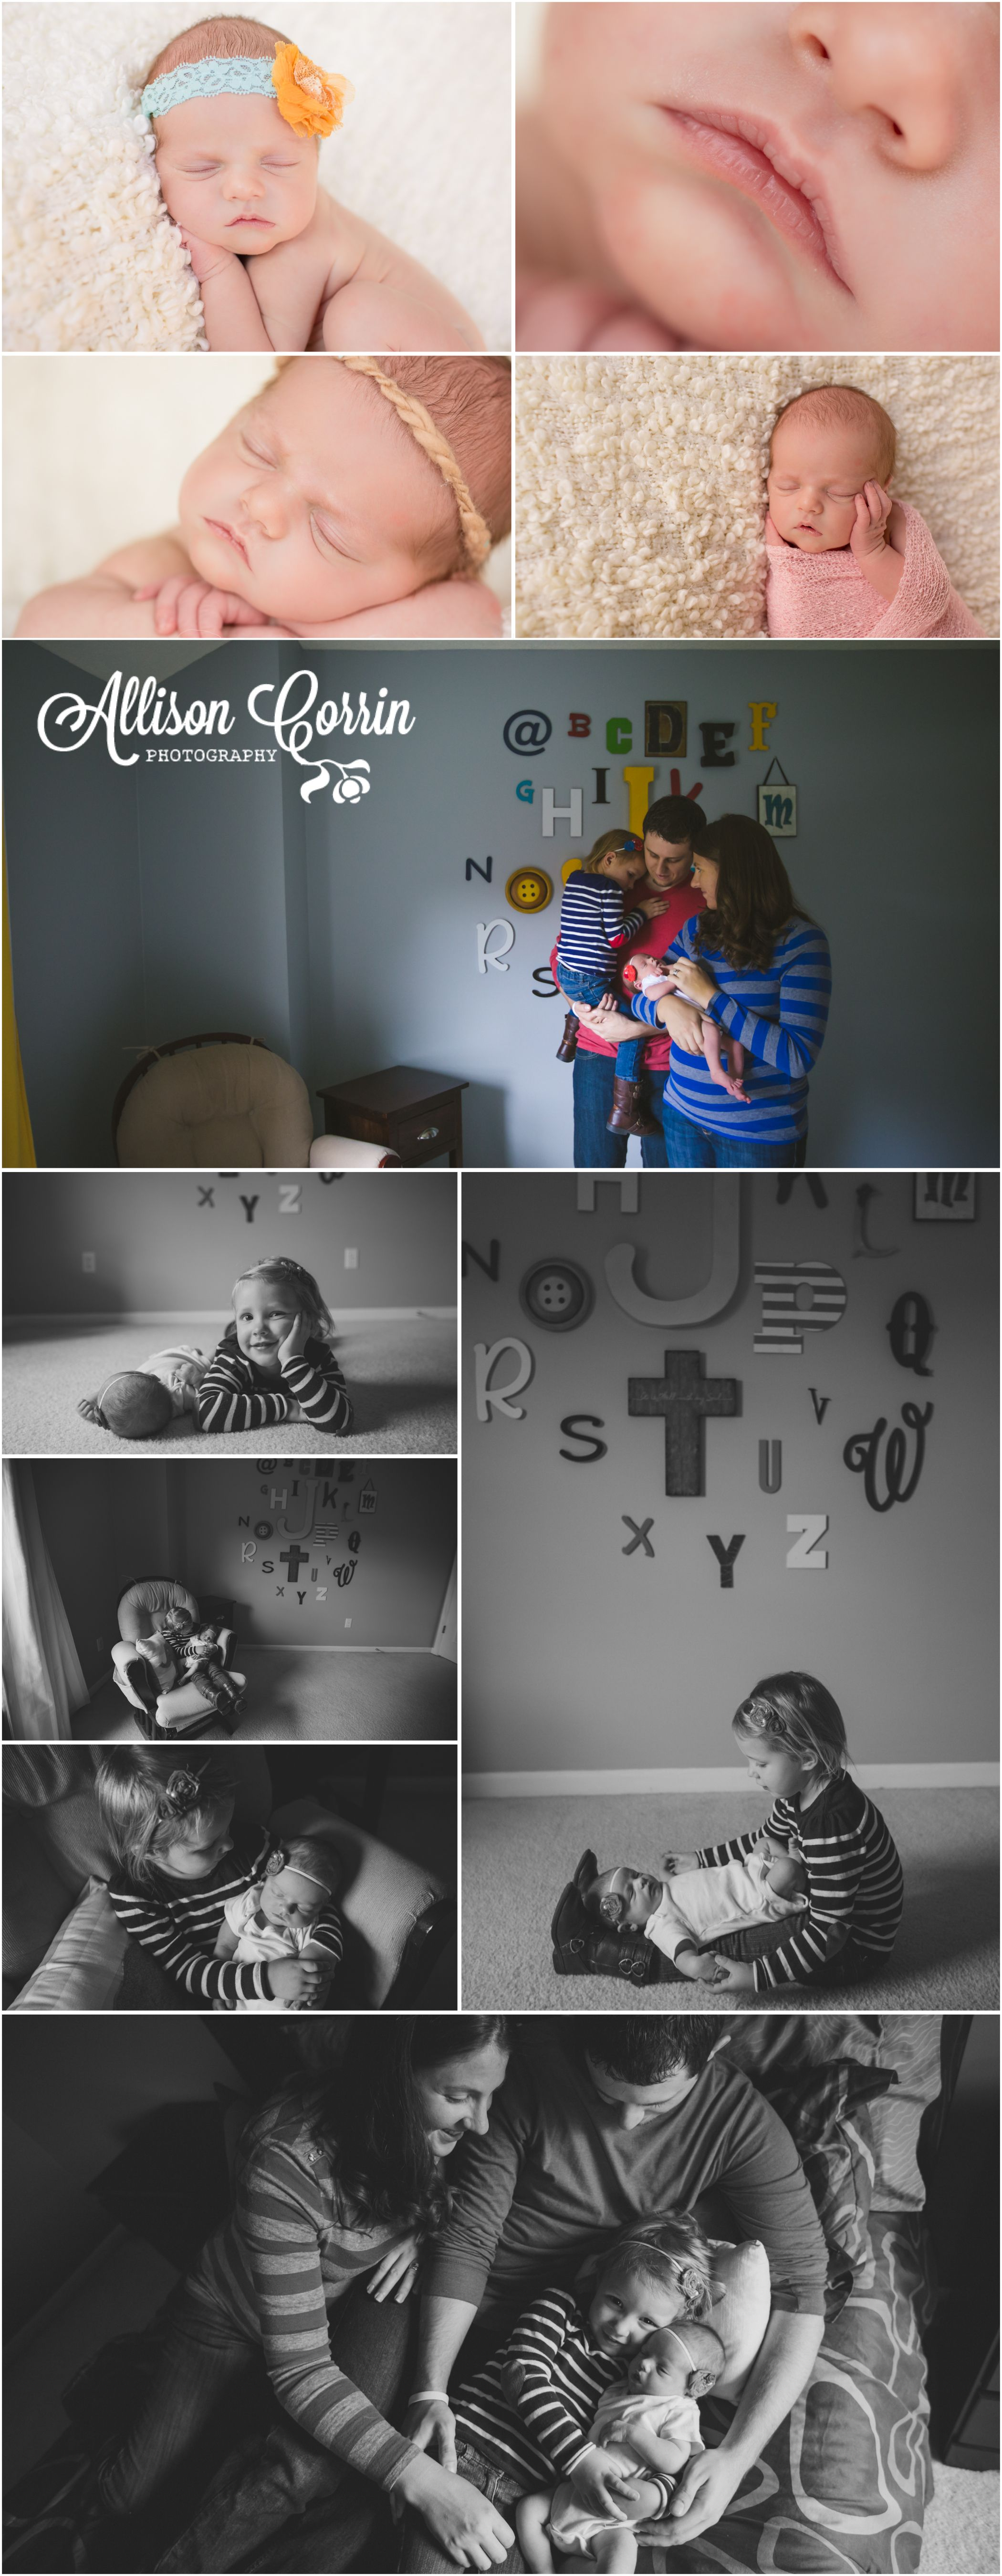 Kansas City Newborn Lifestyle Photographer. Allison Corrin Photography. www.allisoncorrin.com